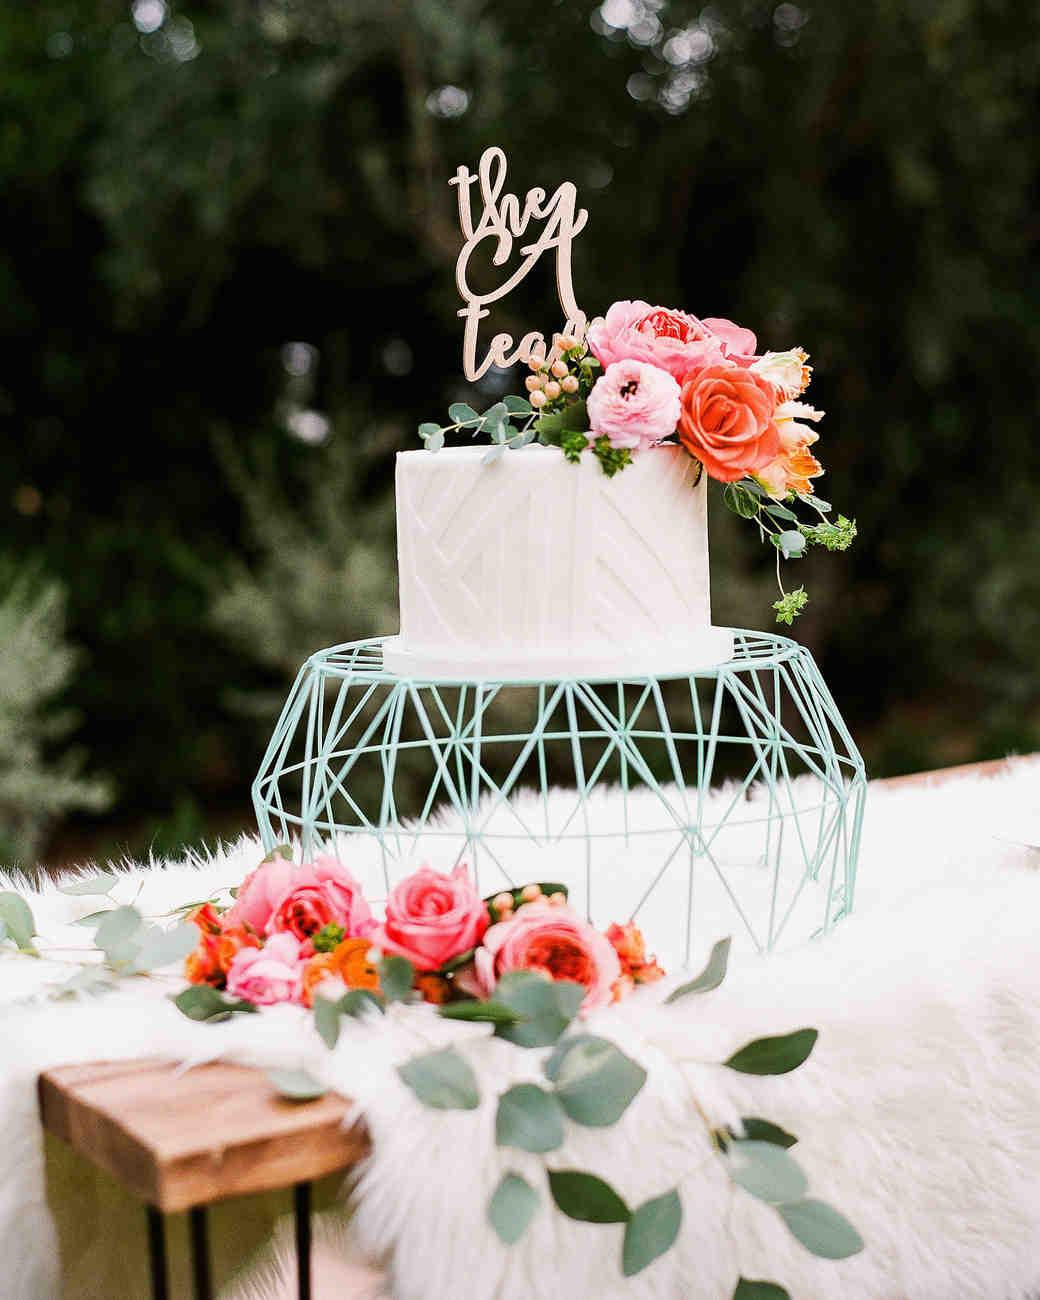 aubrey austin wedding cake